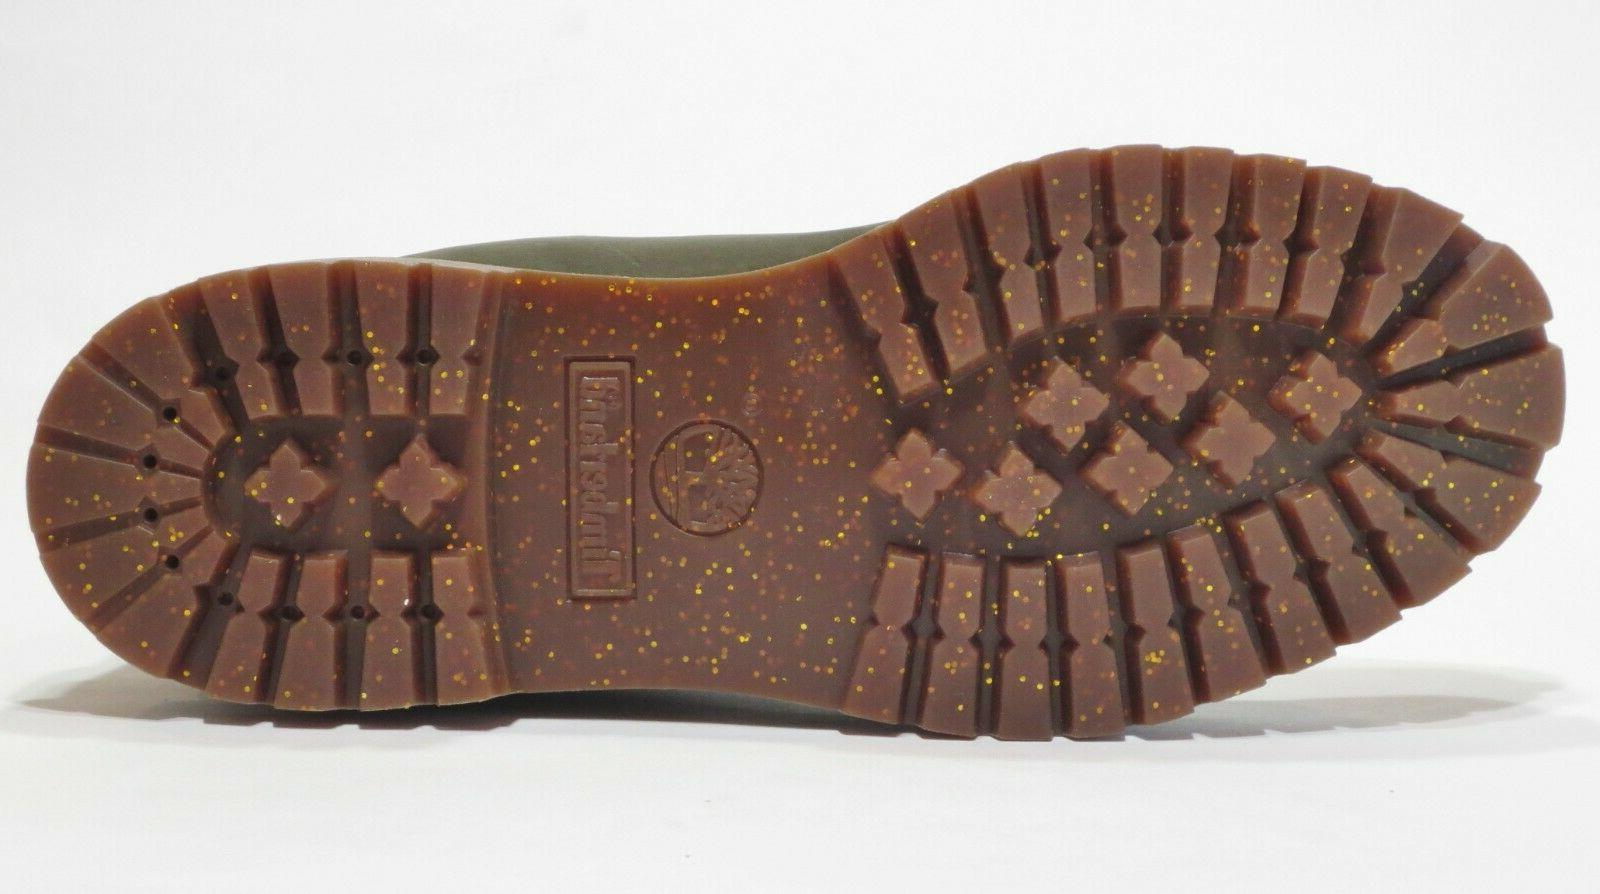 Timberland Men's Premium inch Limited Boots Dark Green